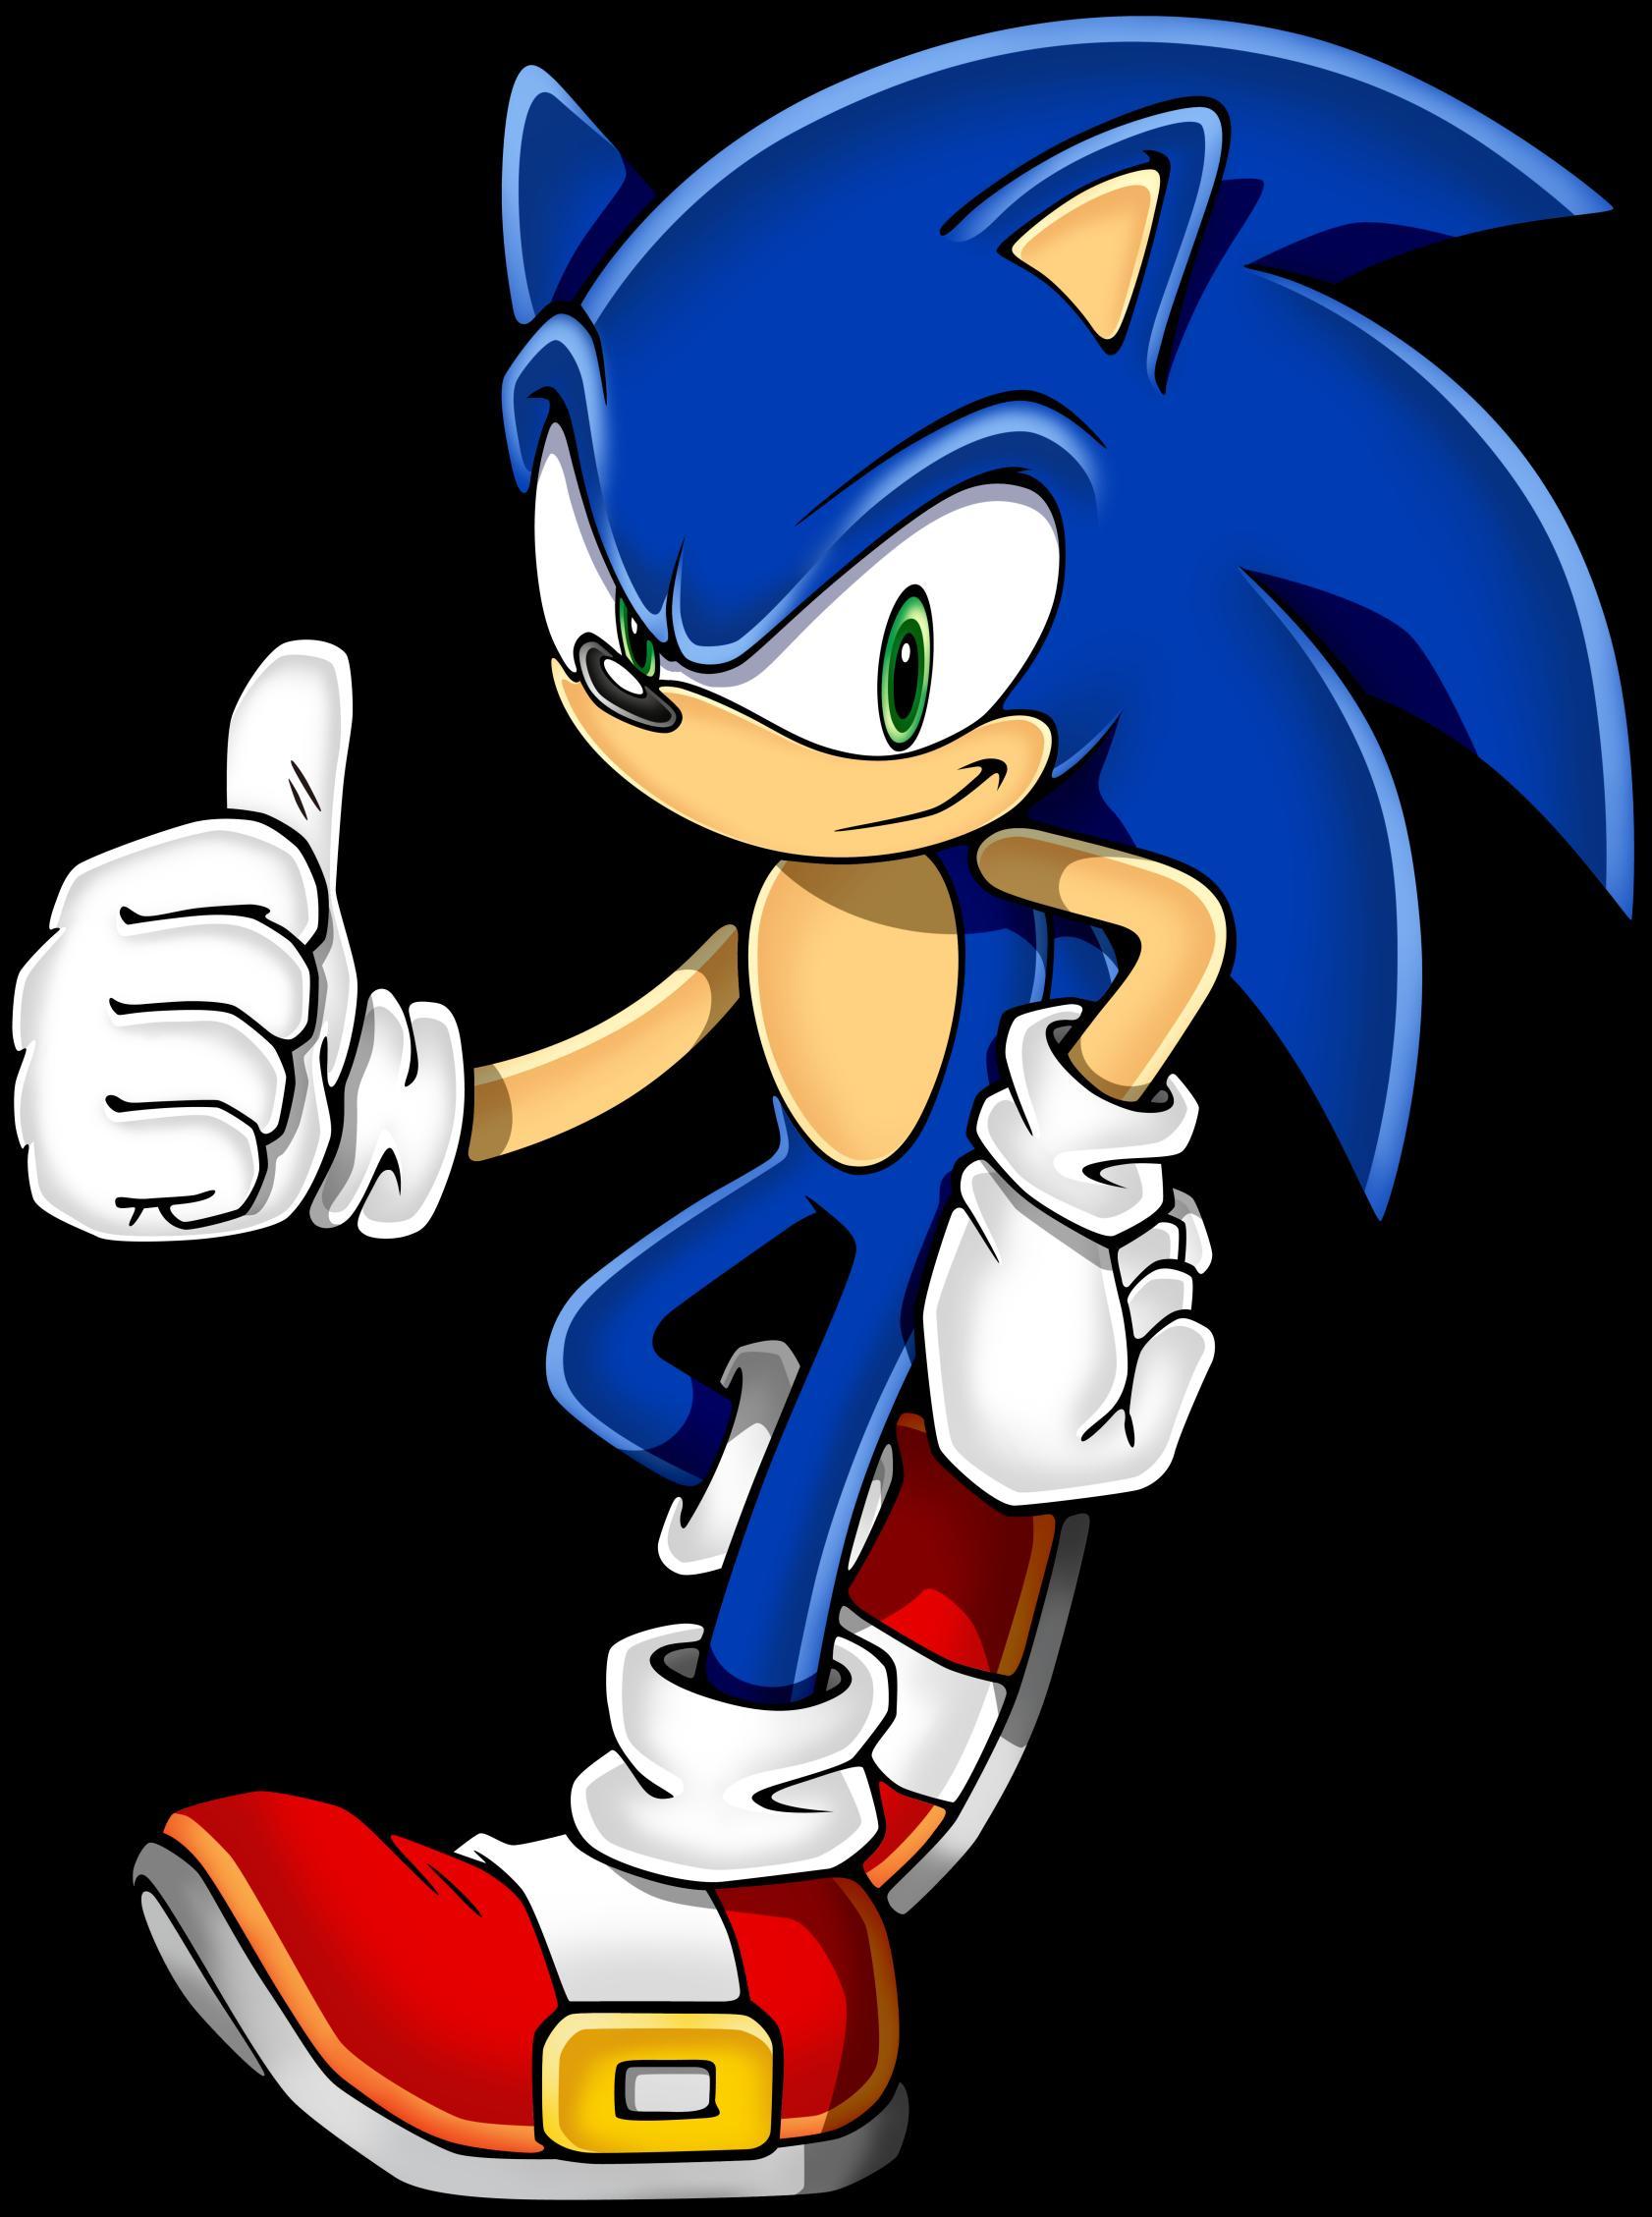 sonic the hedgehog digital - photo #13